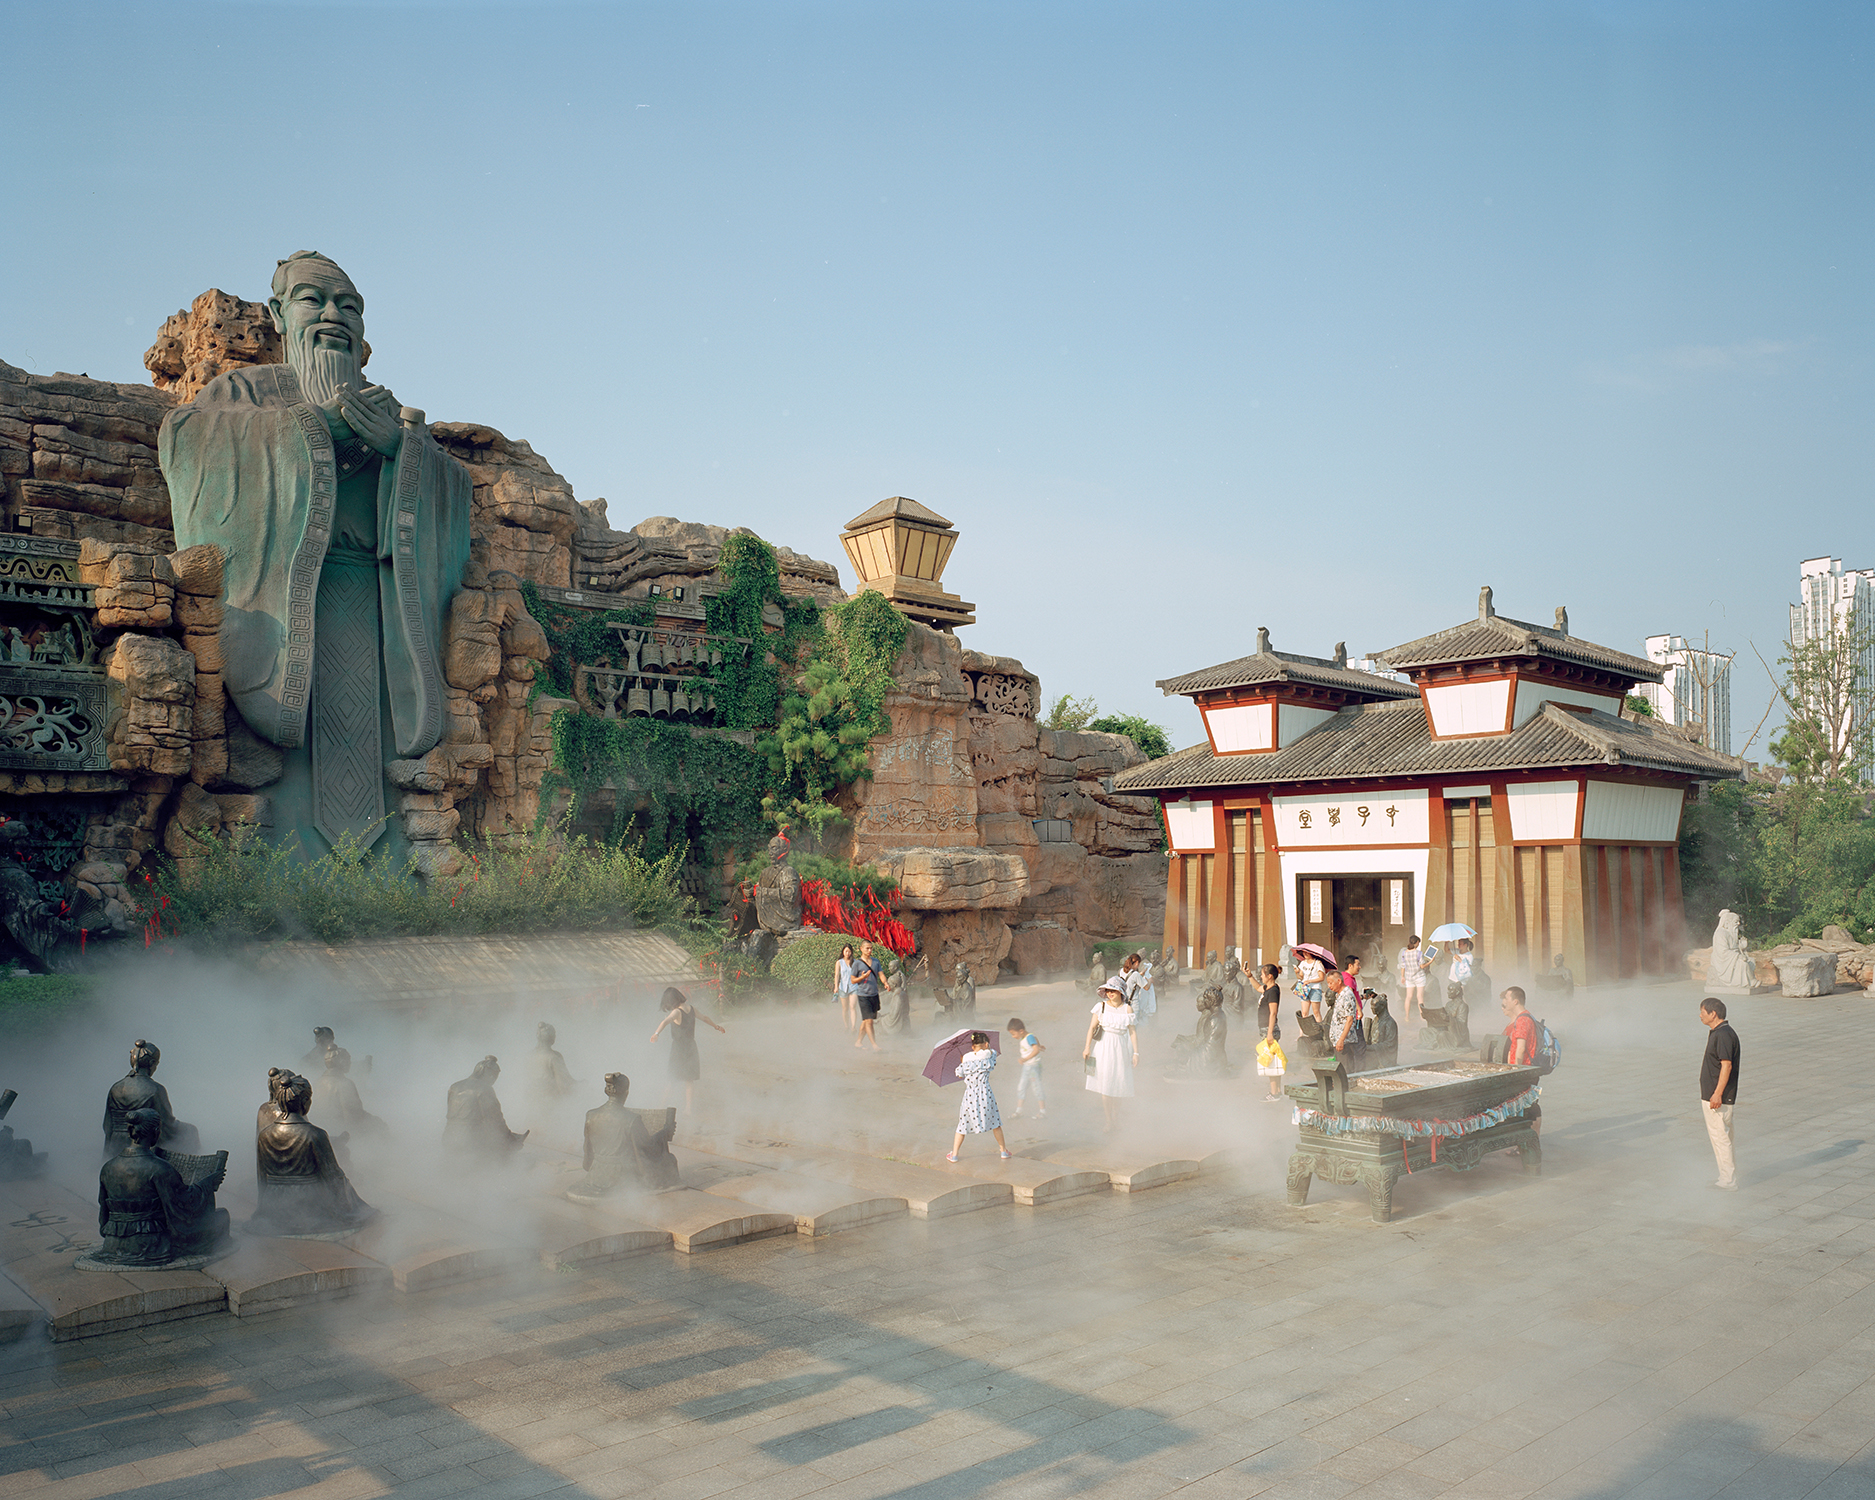 chen-ronghui-2015-09-03-shanghai-photography-of-china.jpg